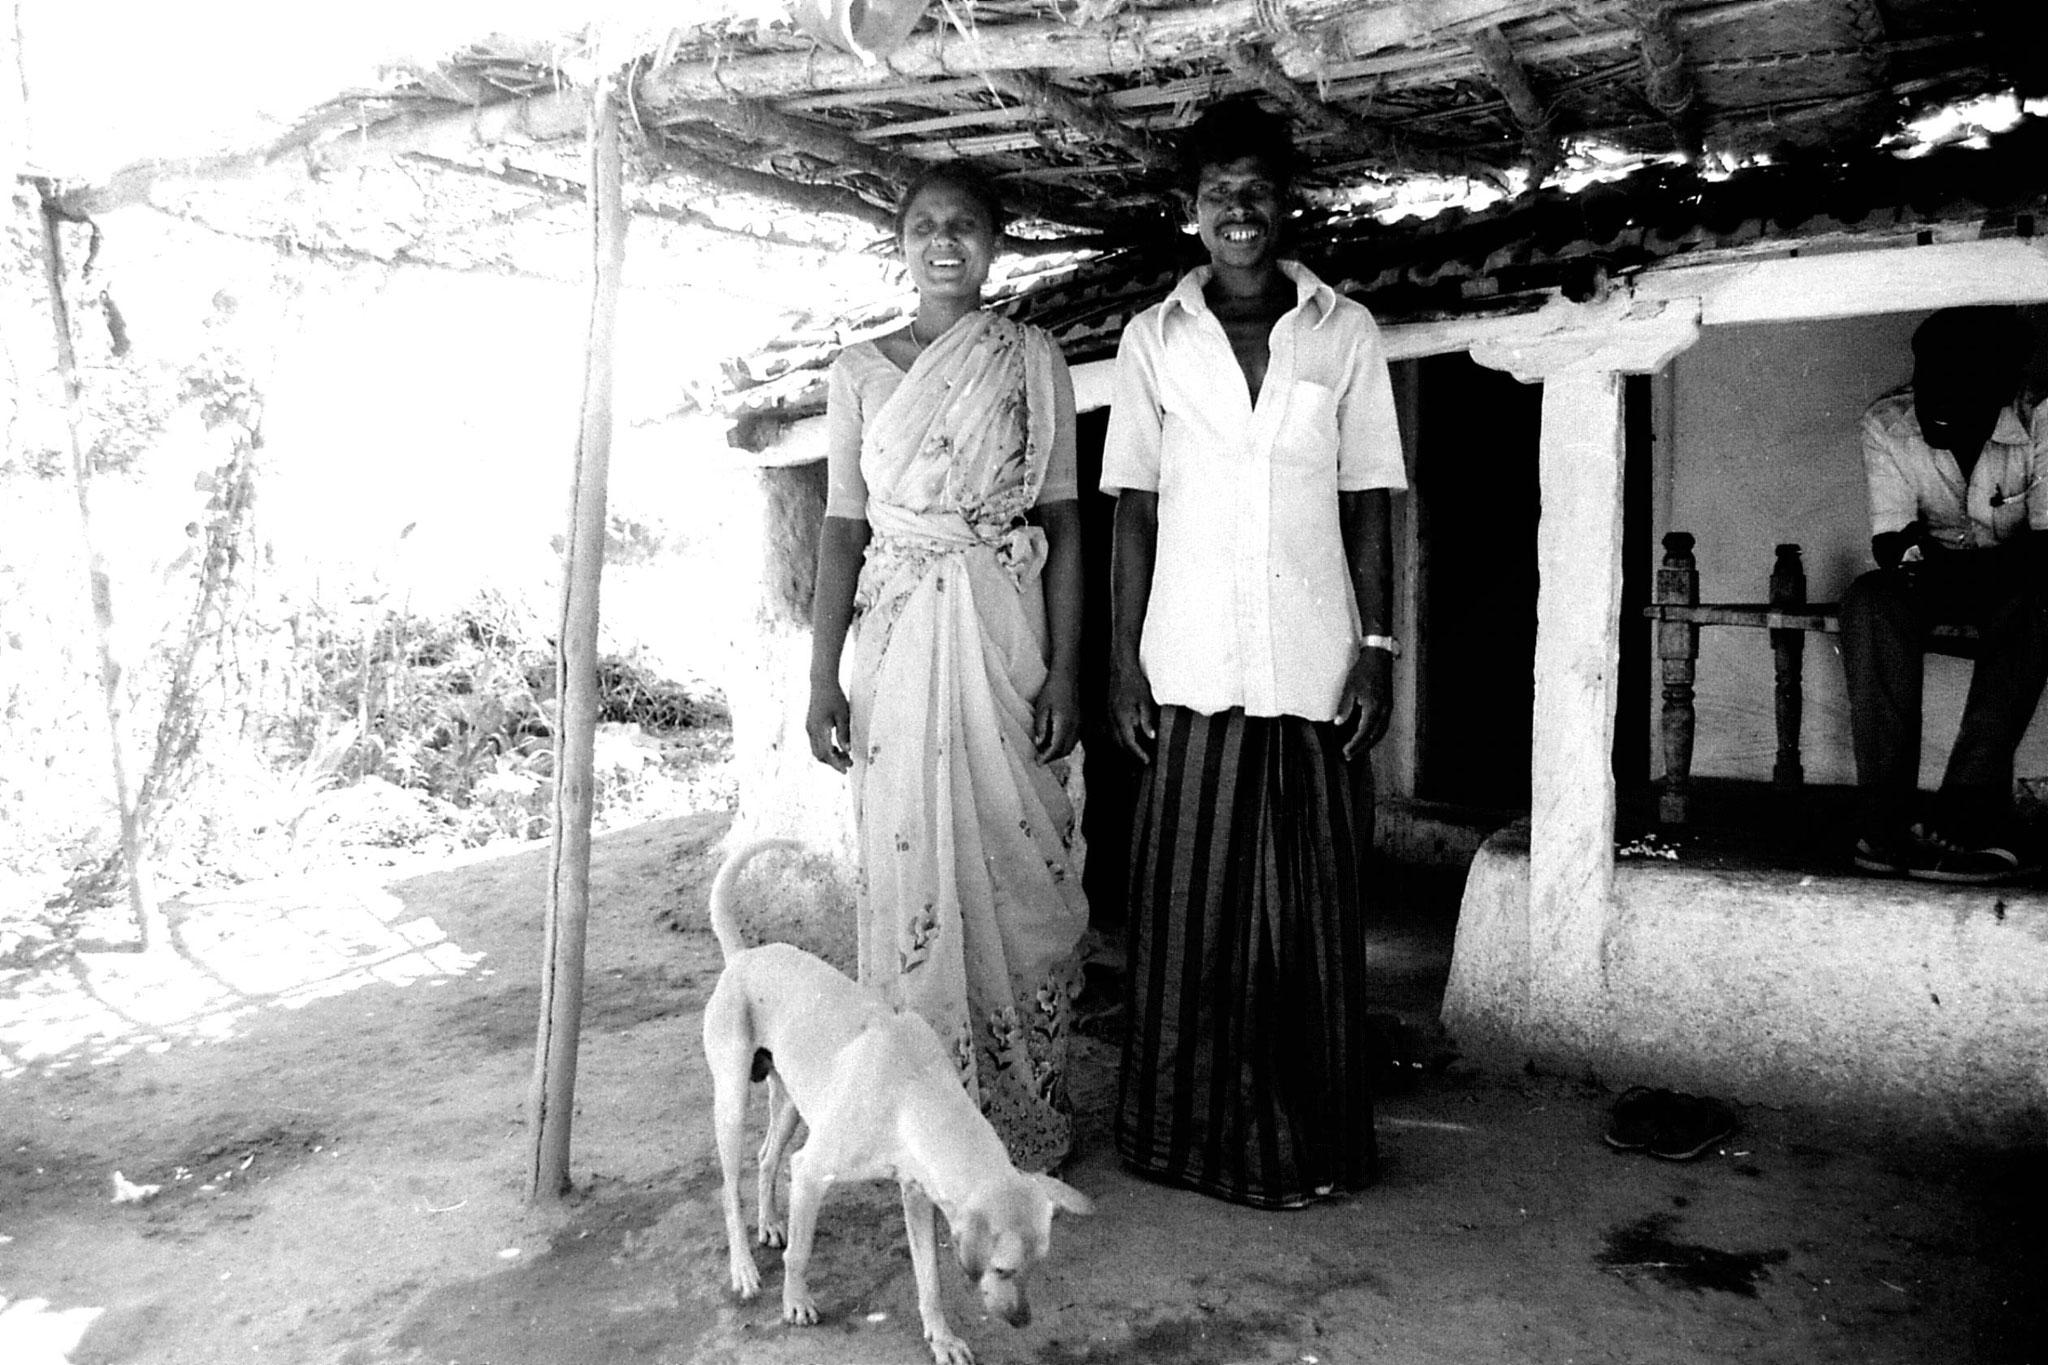 21/2/1990: 23: Batlagundi afforestation project